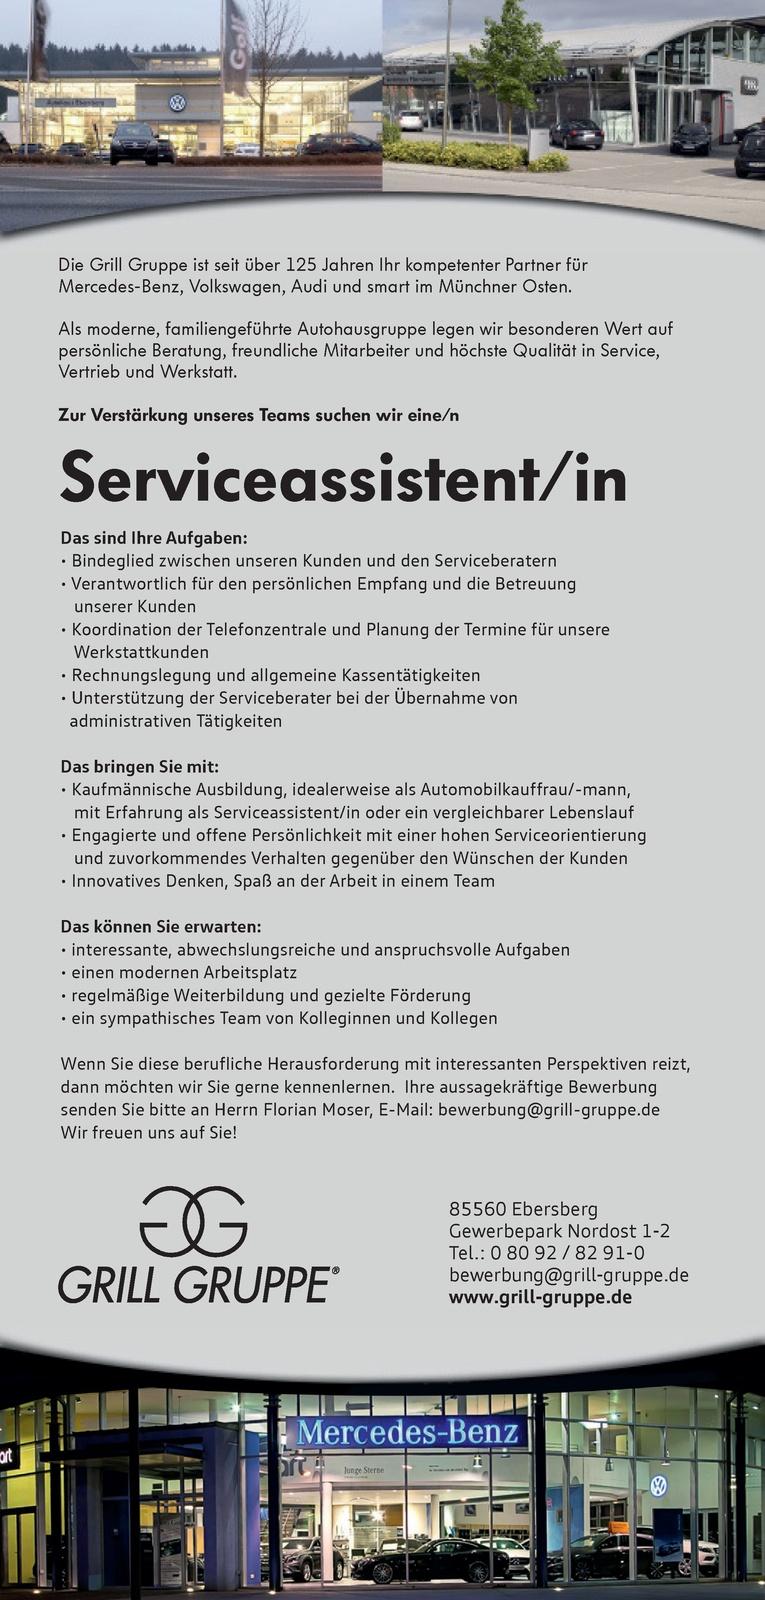 Serviceassistent/in